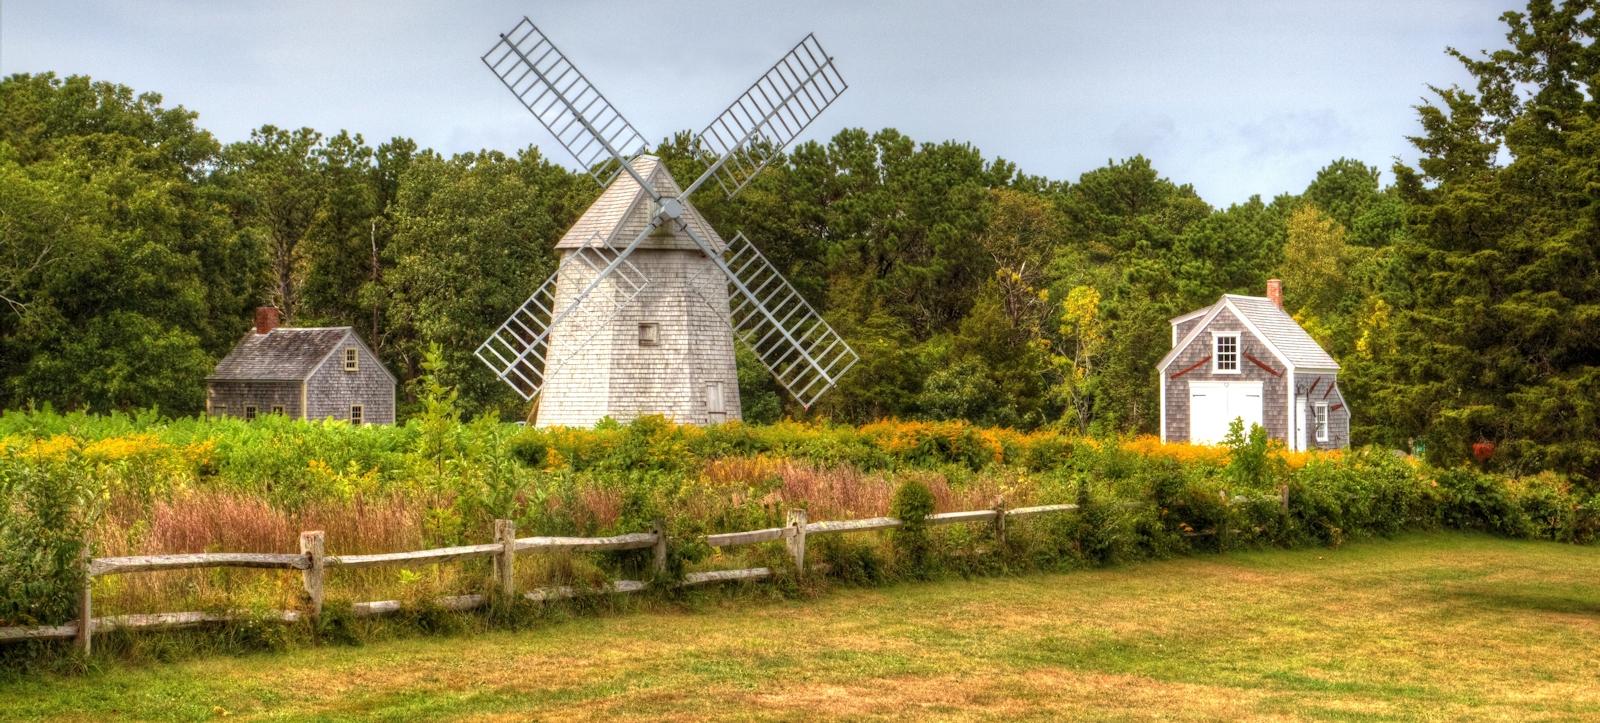 Higgins Farm Windmill in Drummer Boy Park in Brewster, Massachusetts